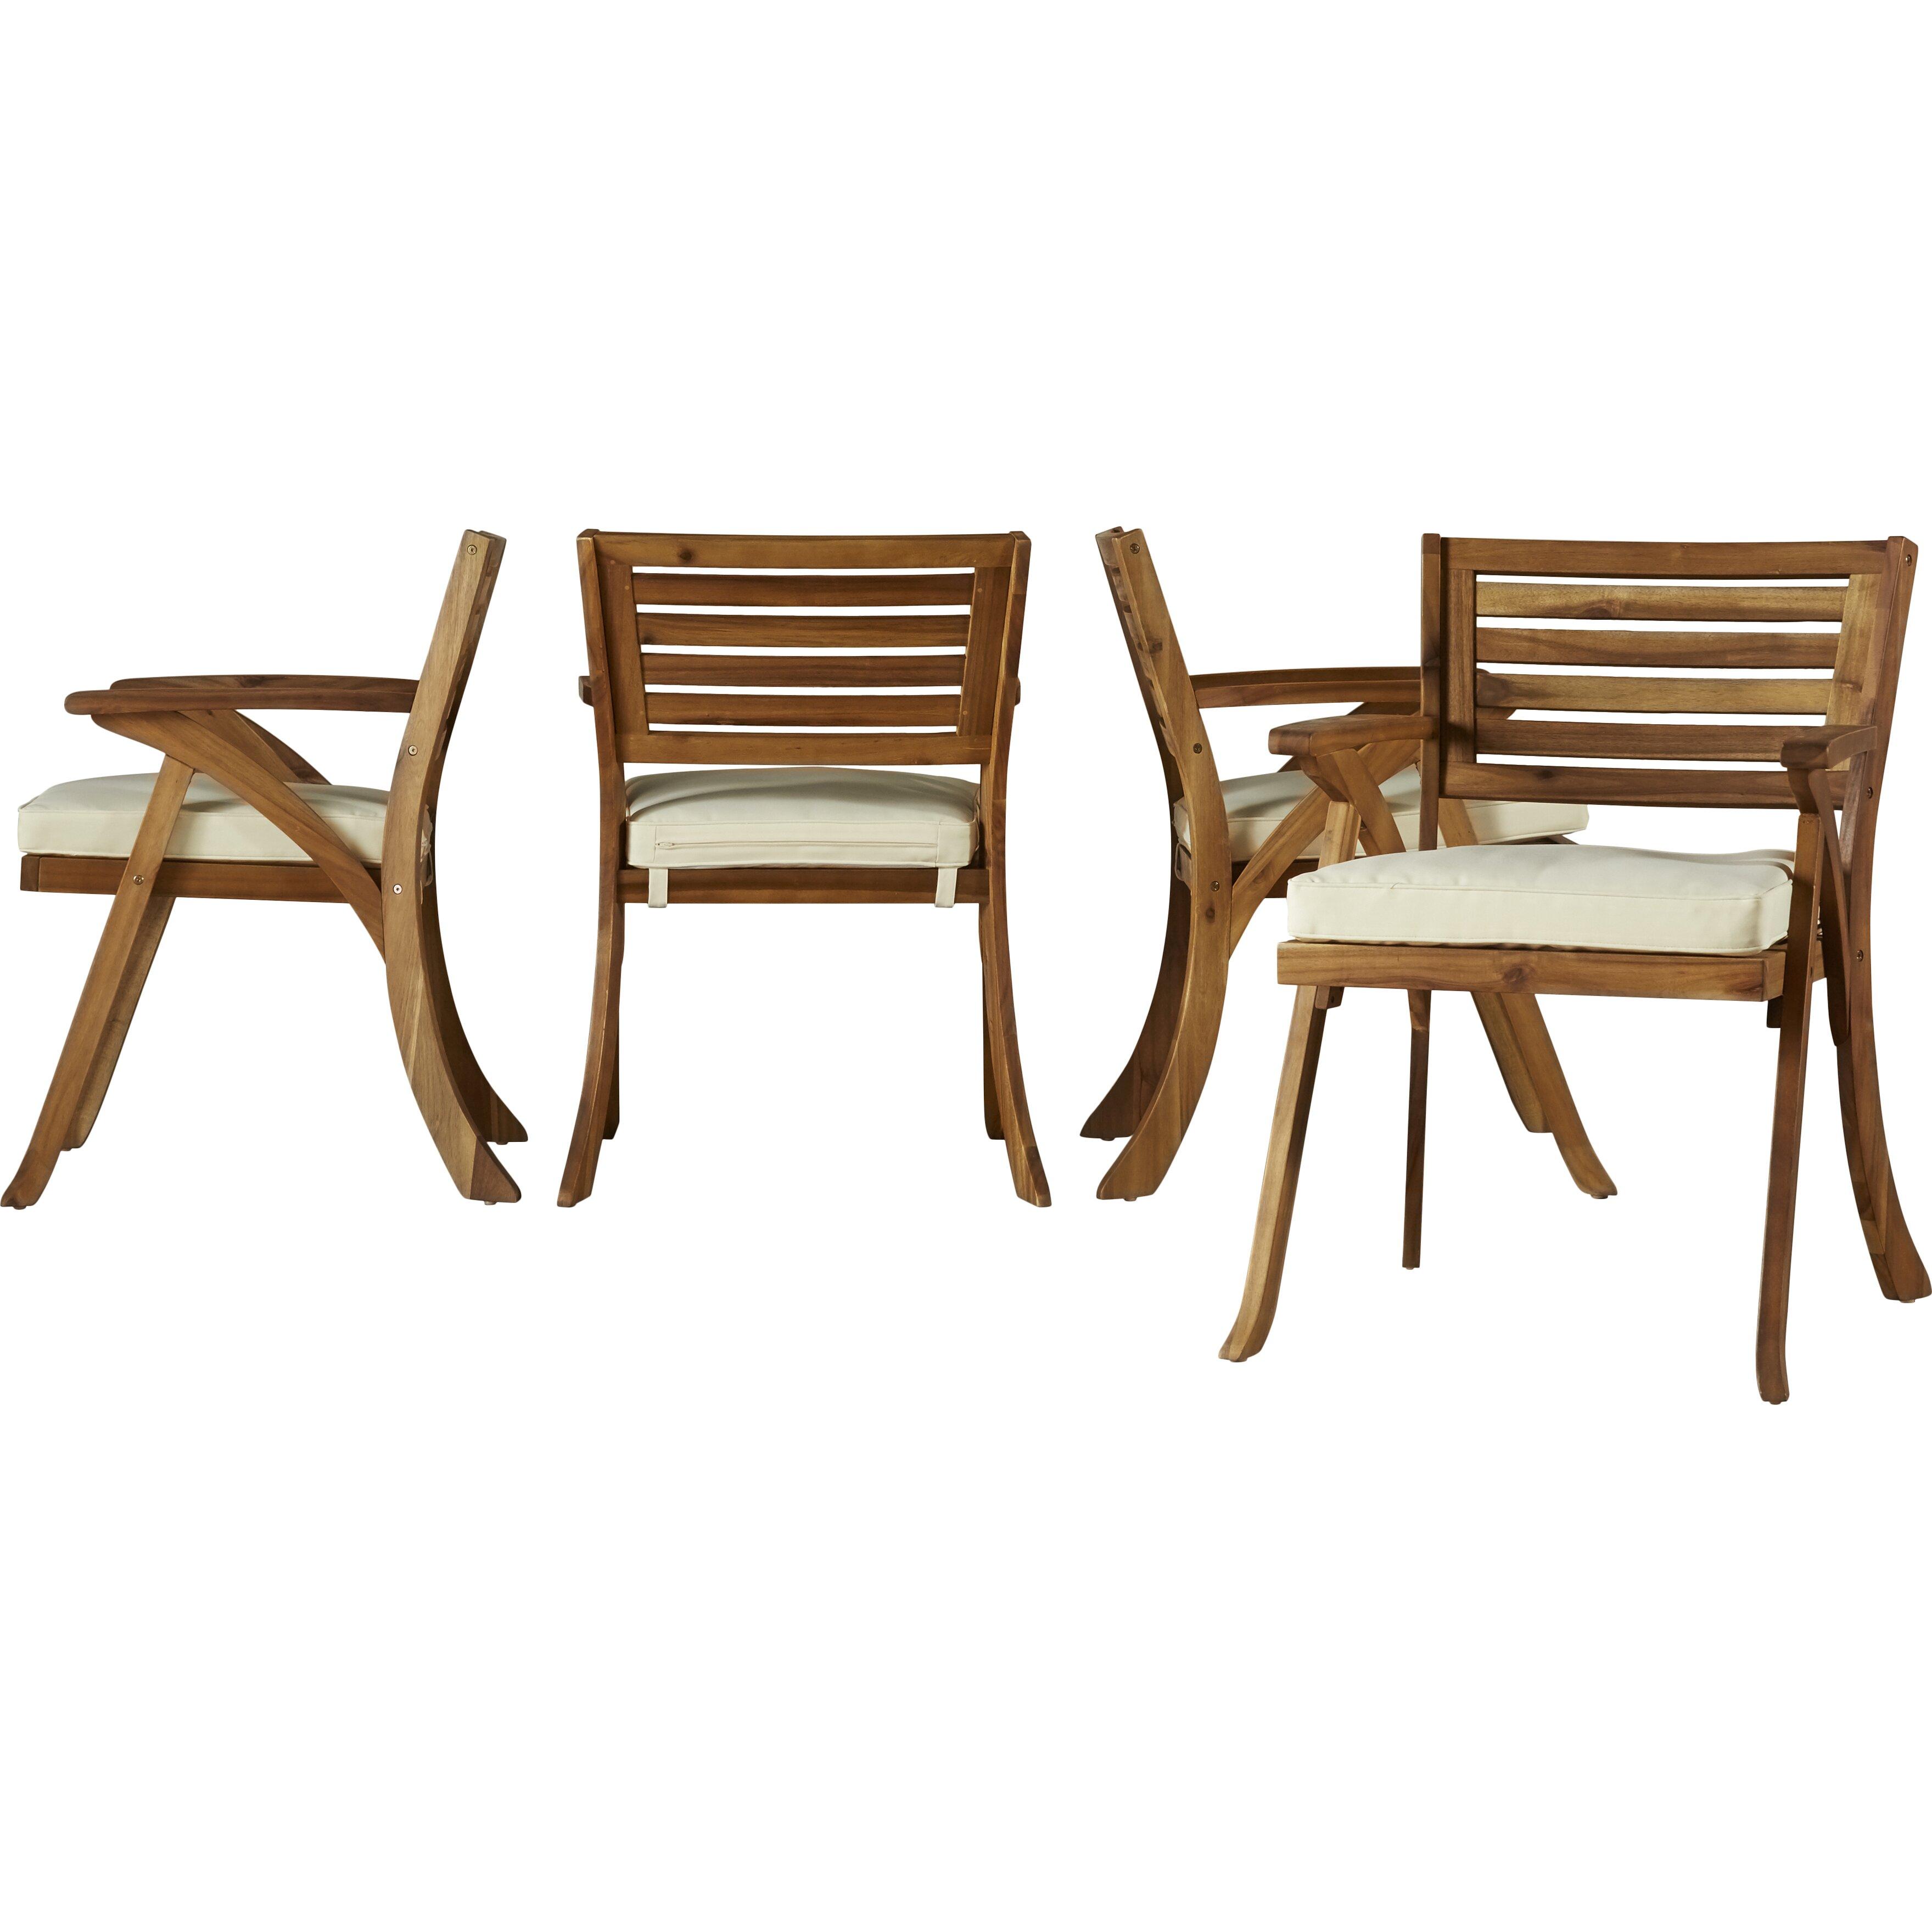 Mercury row ajax 5 piece dining set with cushion reviews for 5 piece dining set